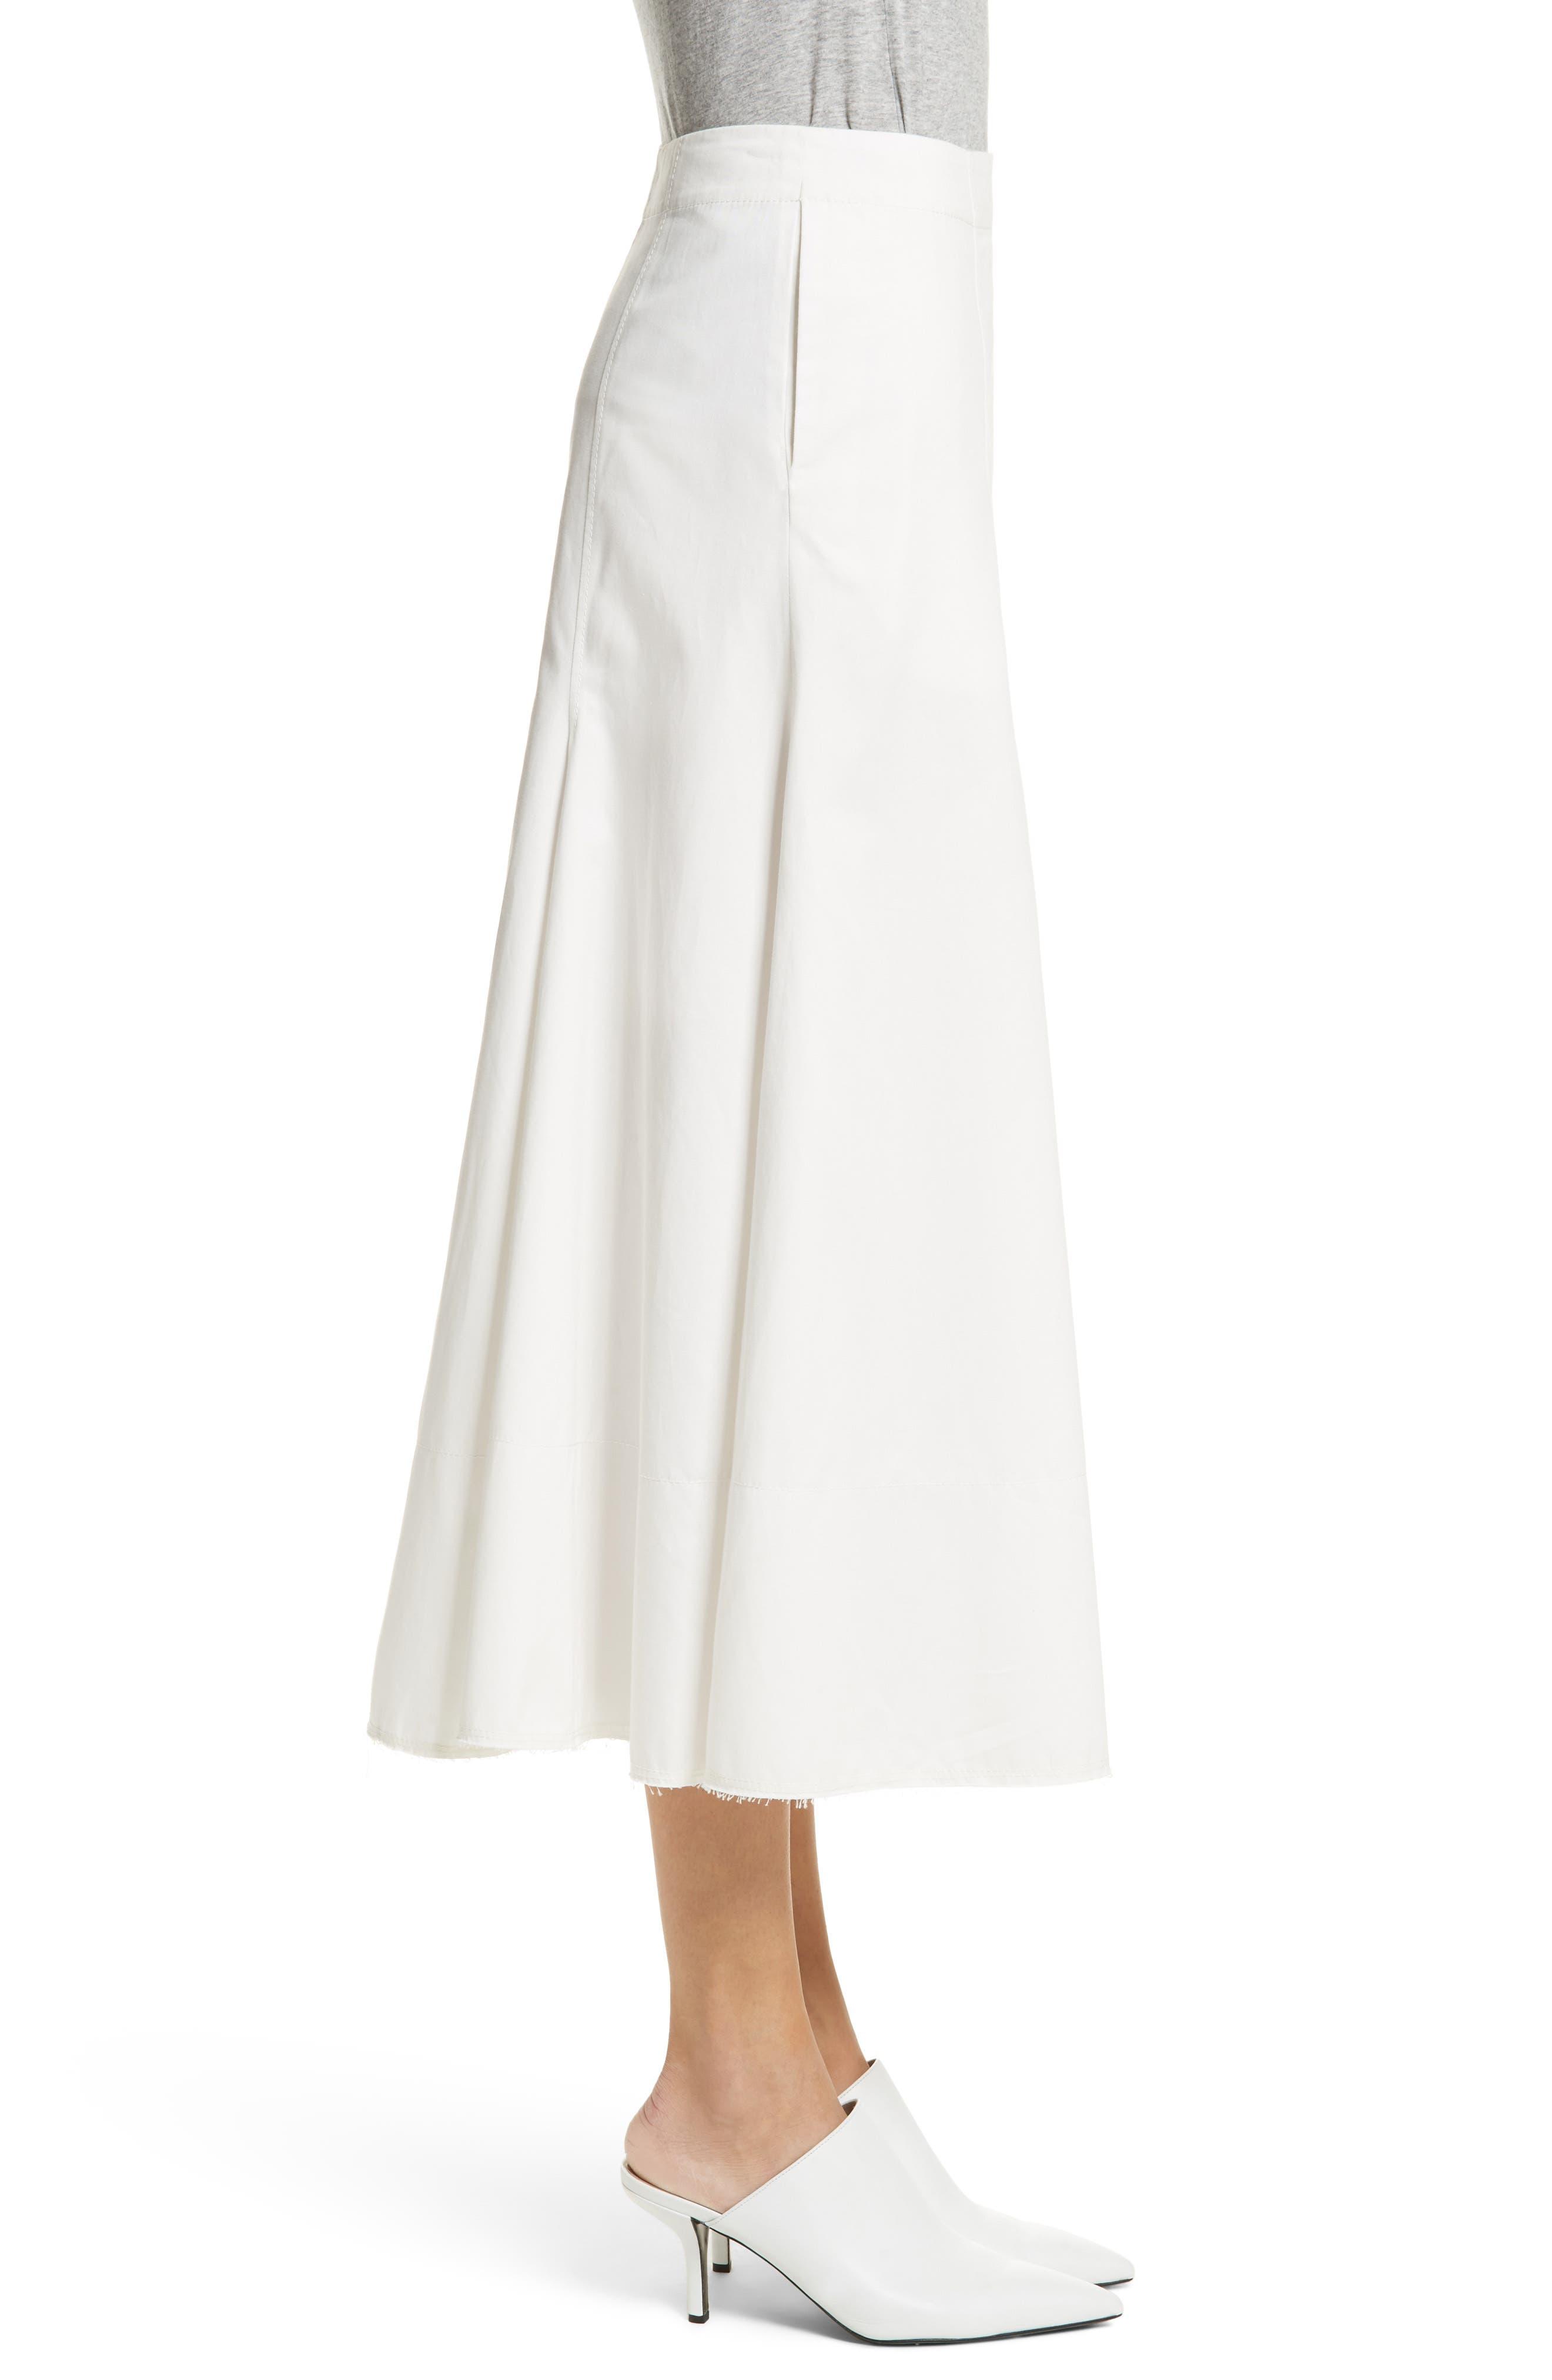 Twill Chino Midi Skirt,                             Alternate thumbnail 3, color,                             102